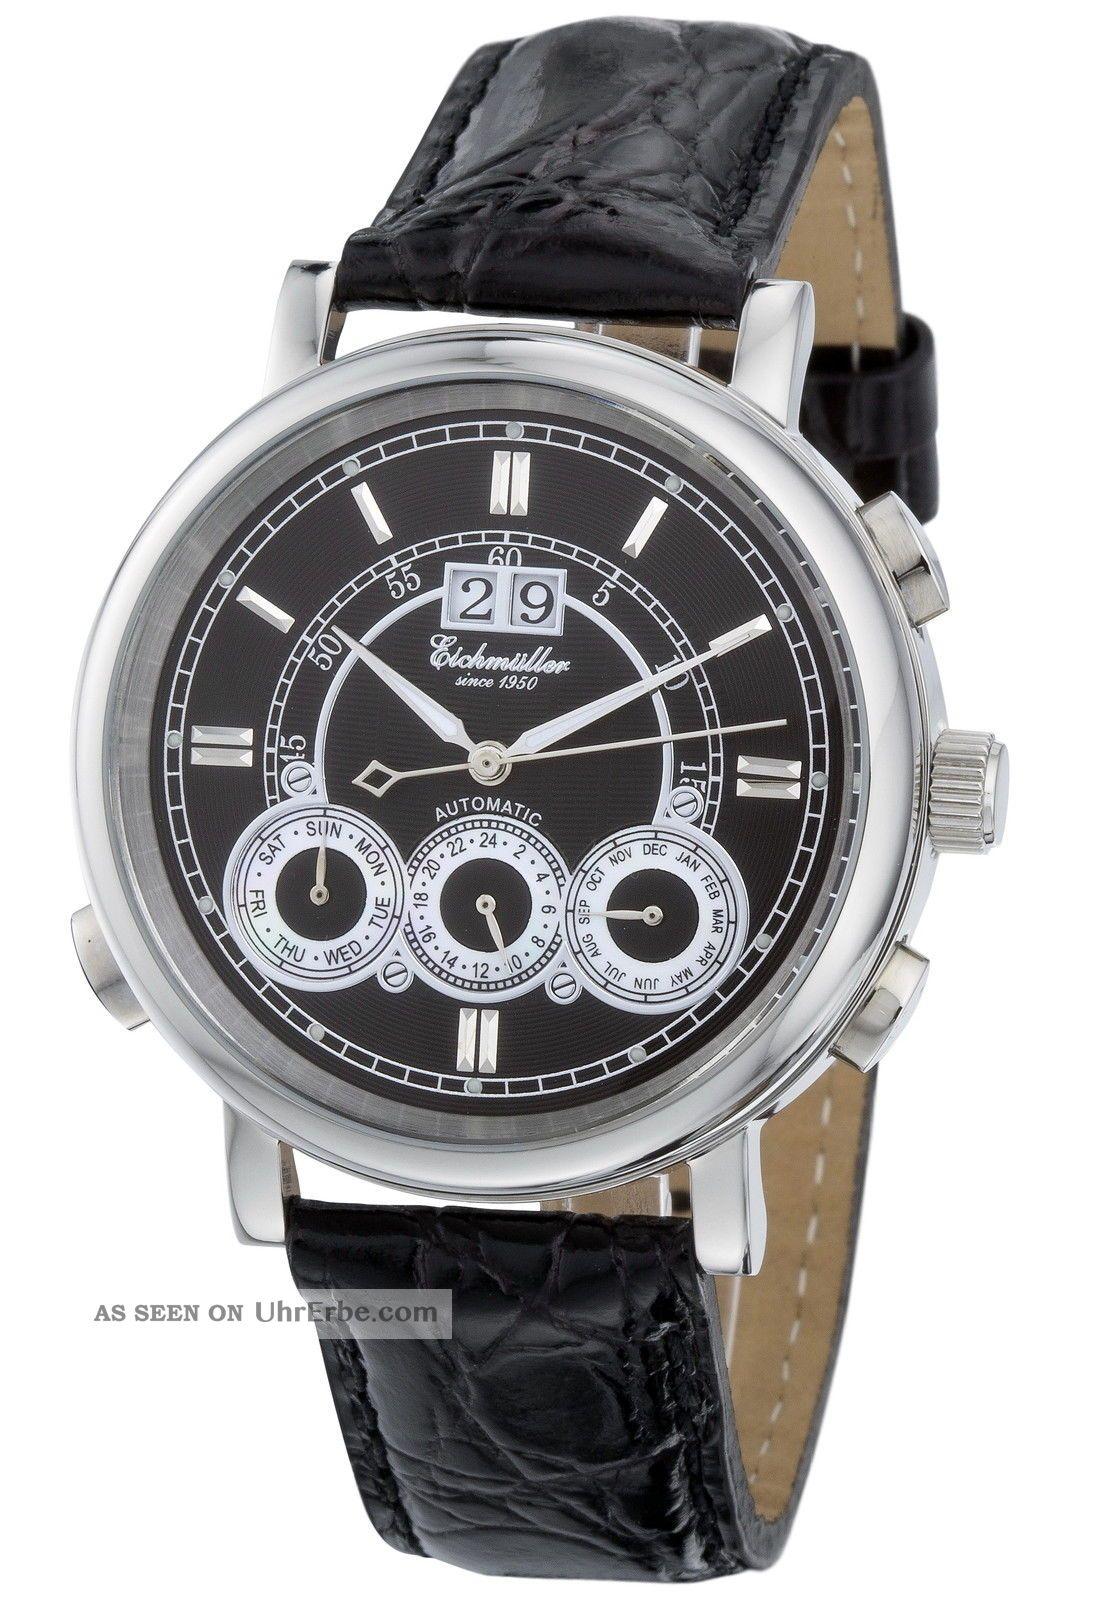 Exklusive EichmÜller Automatikuhr 7802 Herrenuhr Business Uhr Edelstahl M.  Box Armbanduhren Bild